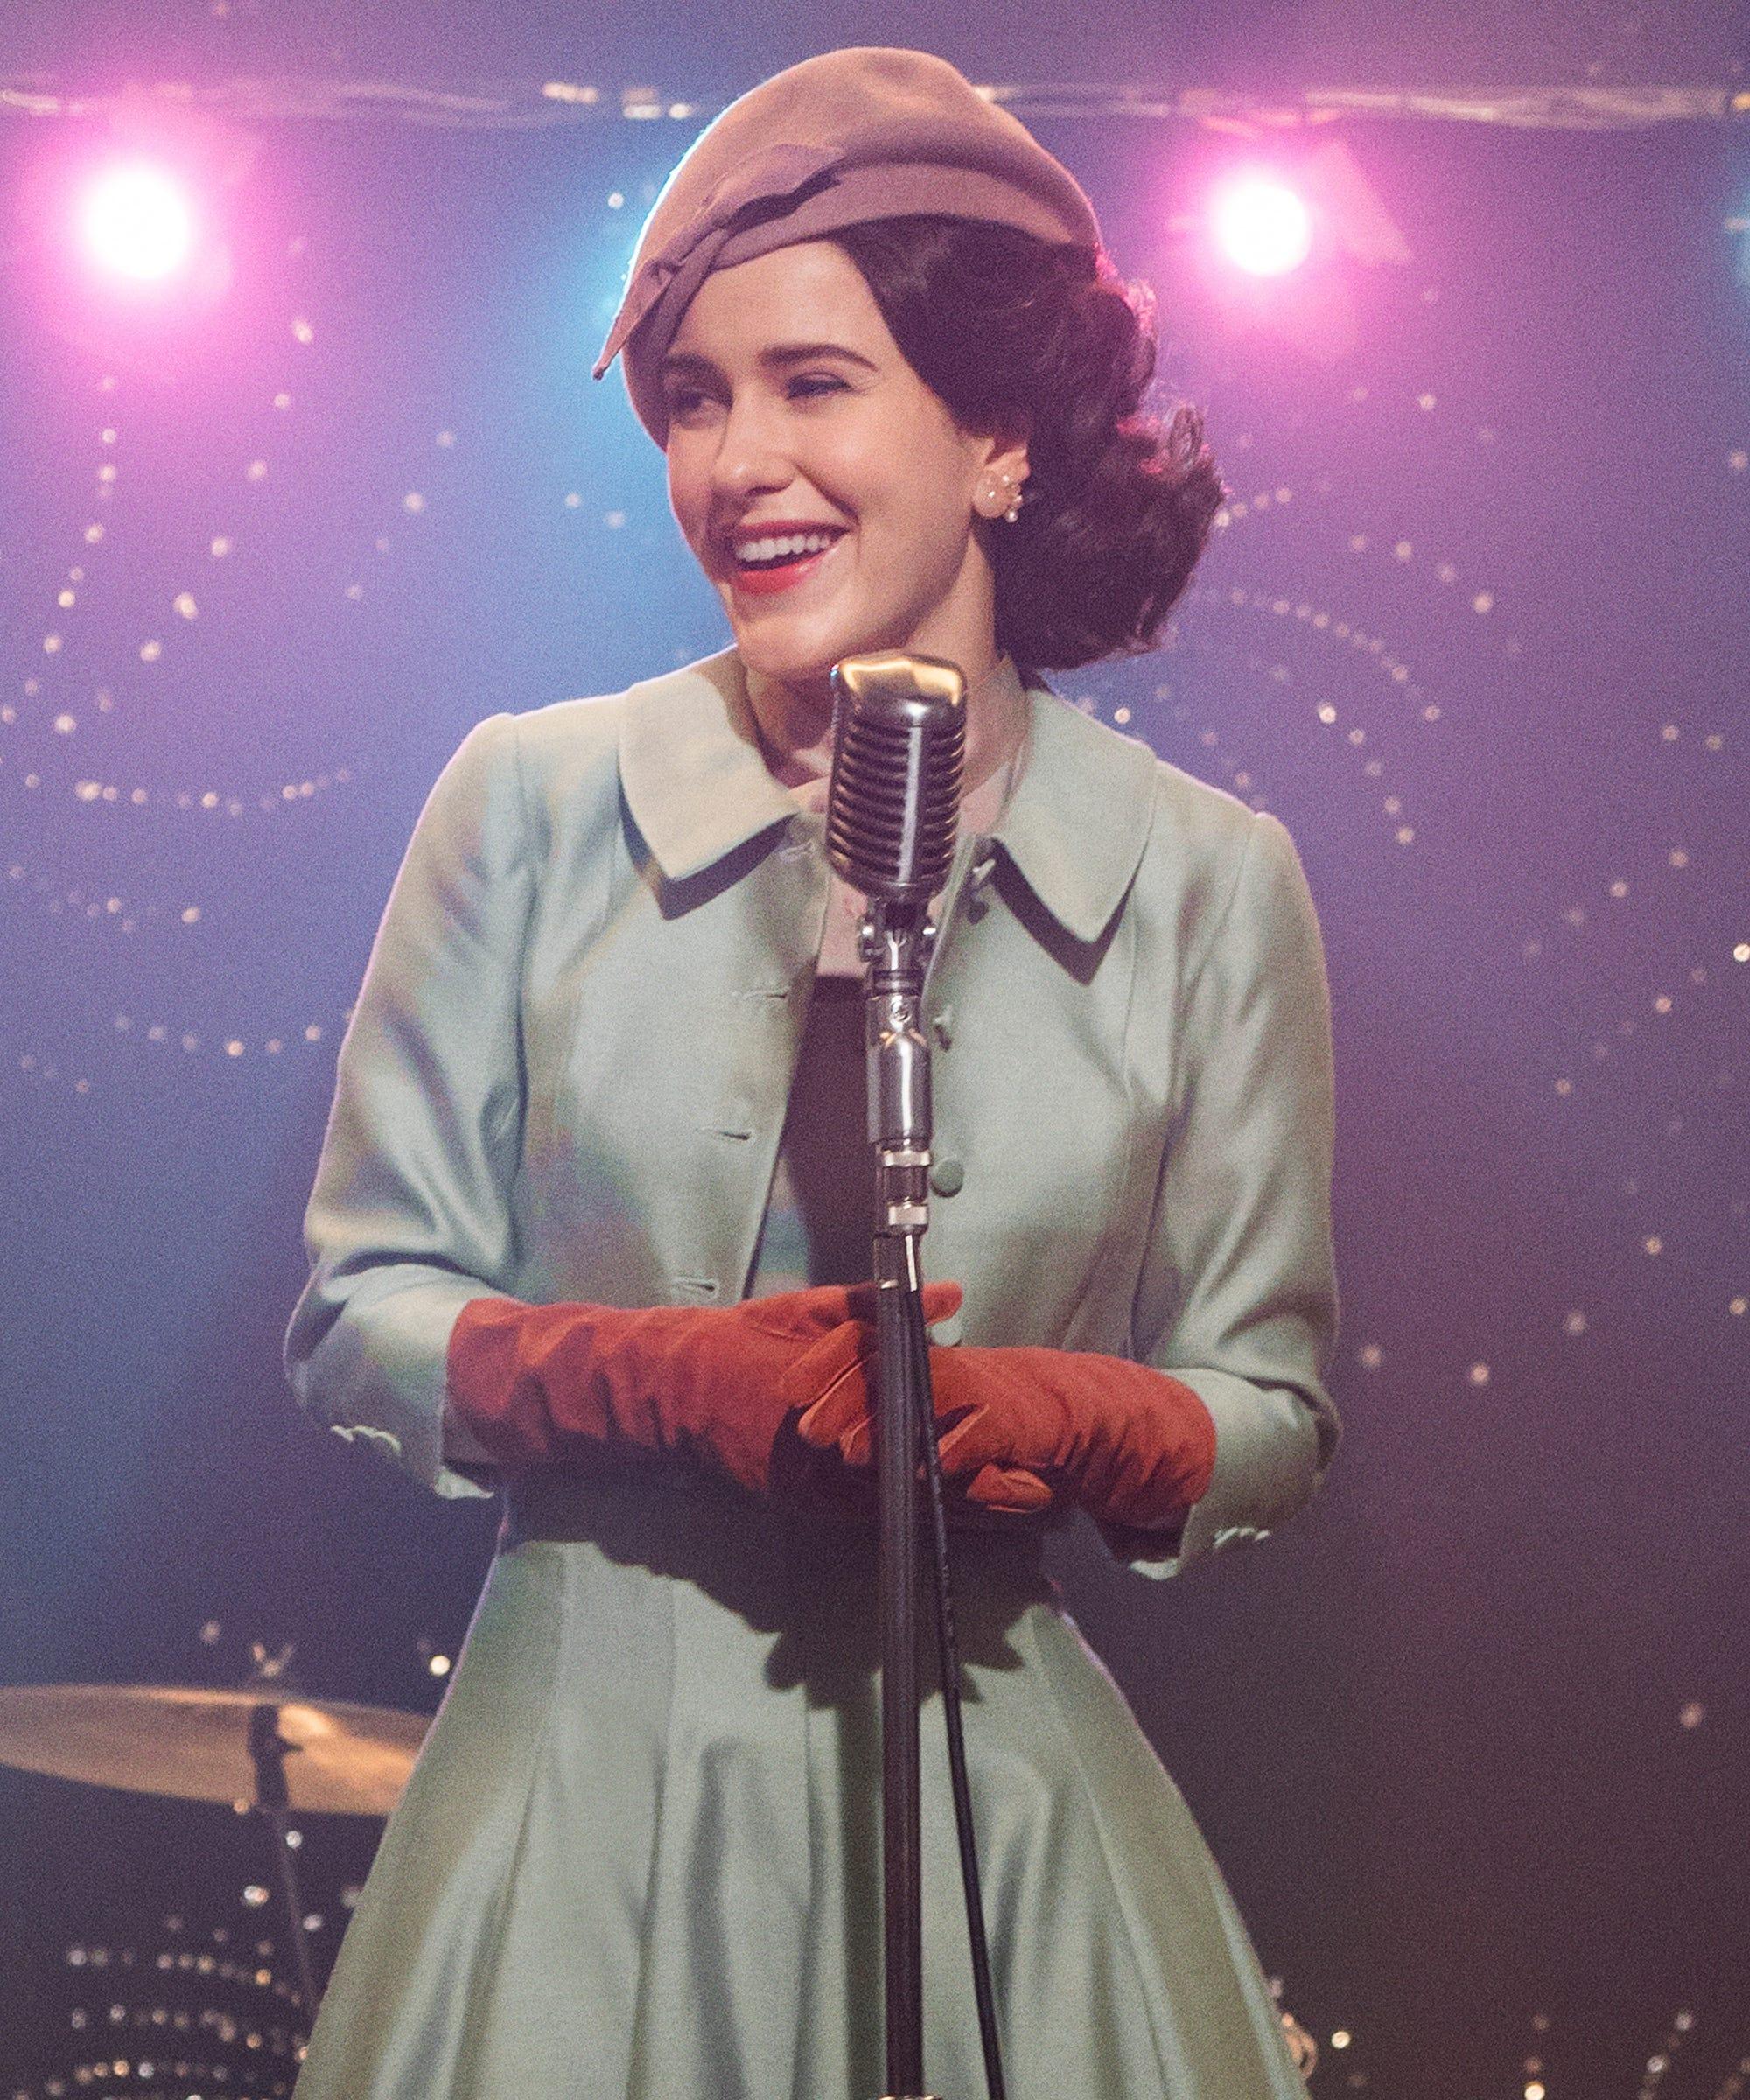 When Will The Marvelous Mrs. Maisel Season 3 Premiere On Amazon?